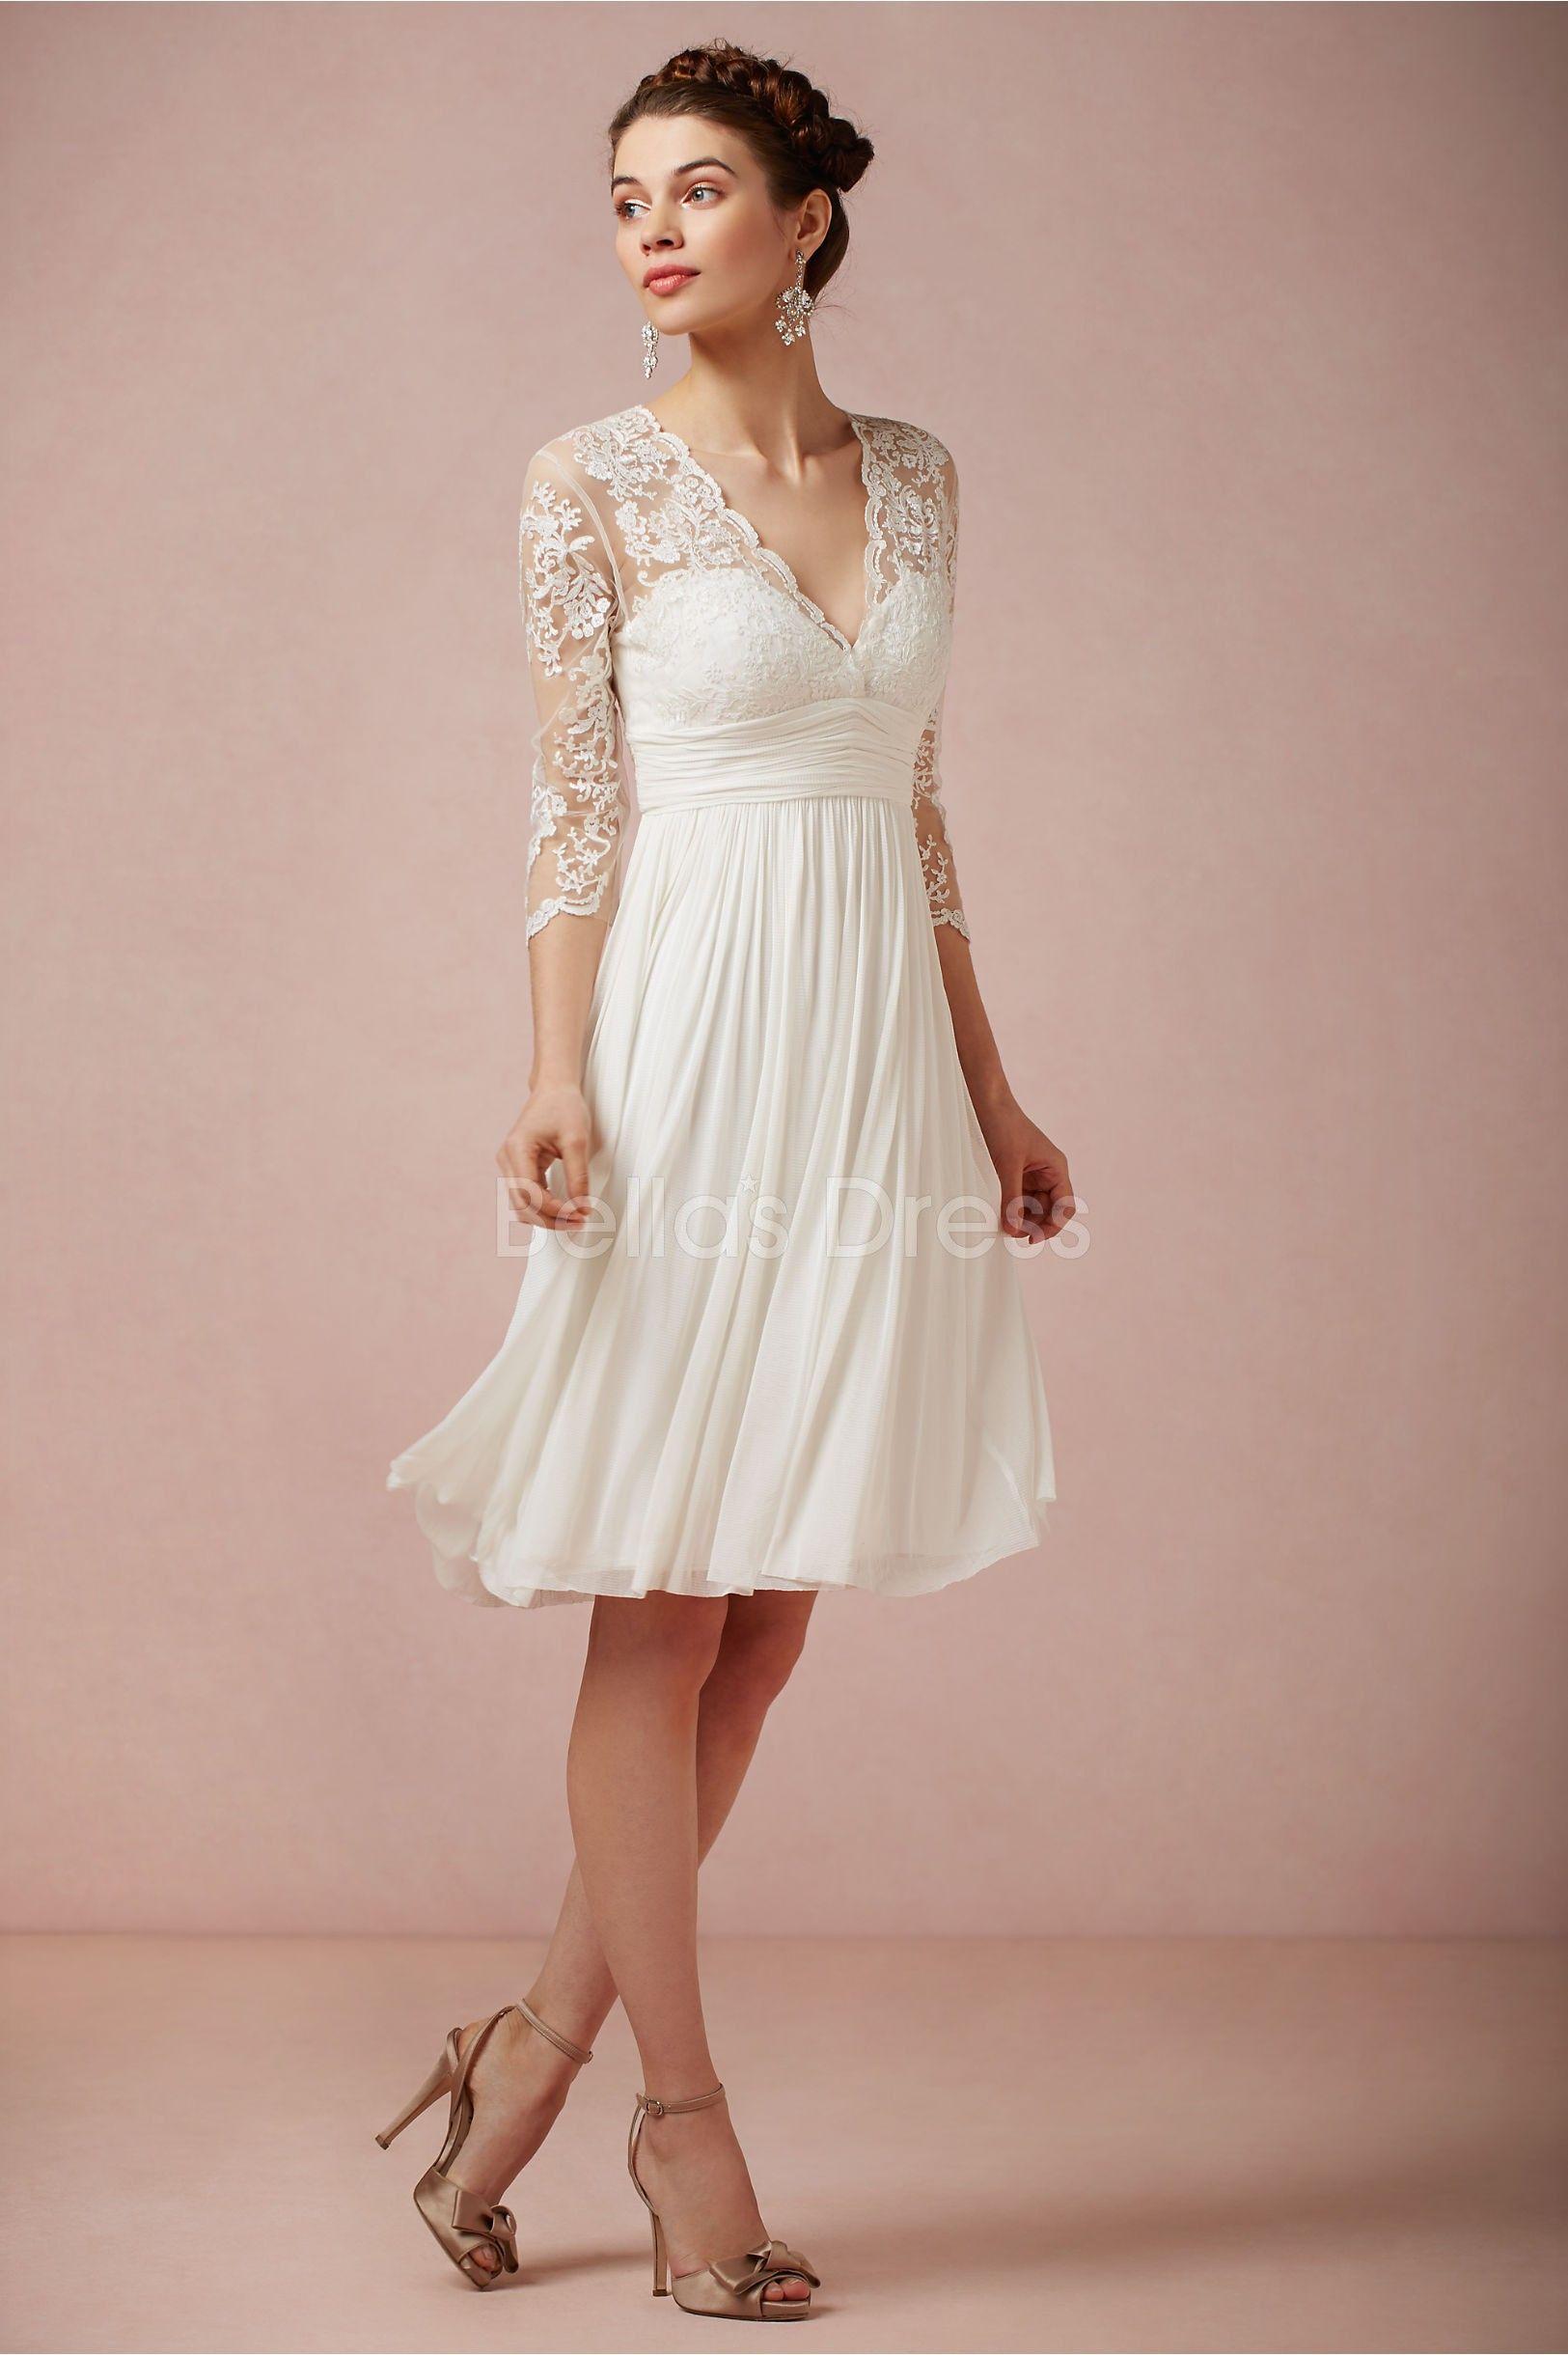 Knee Length Lace Wedding Dresses Knee Length V Neck Sheath